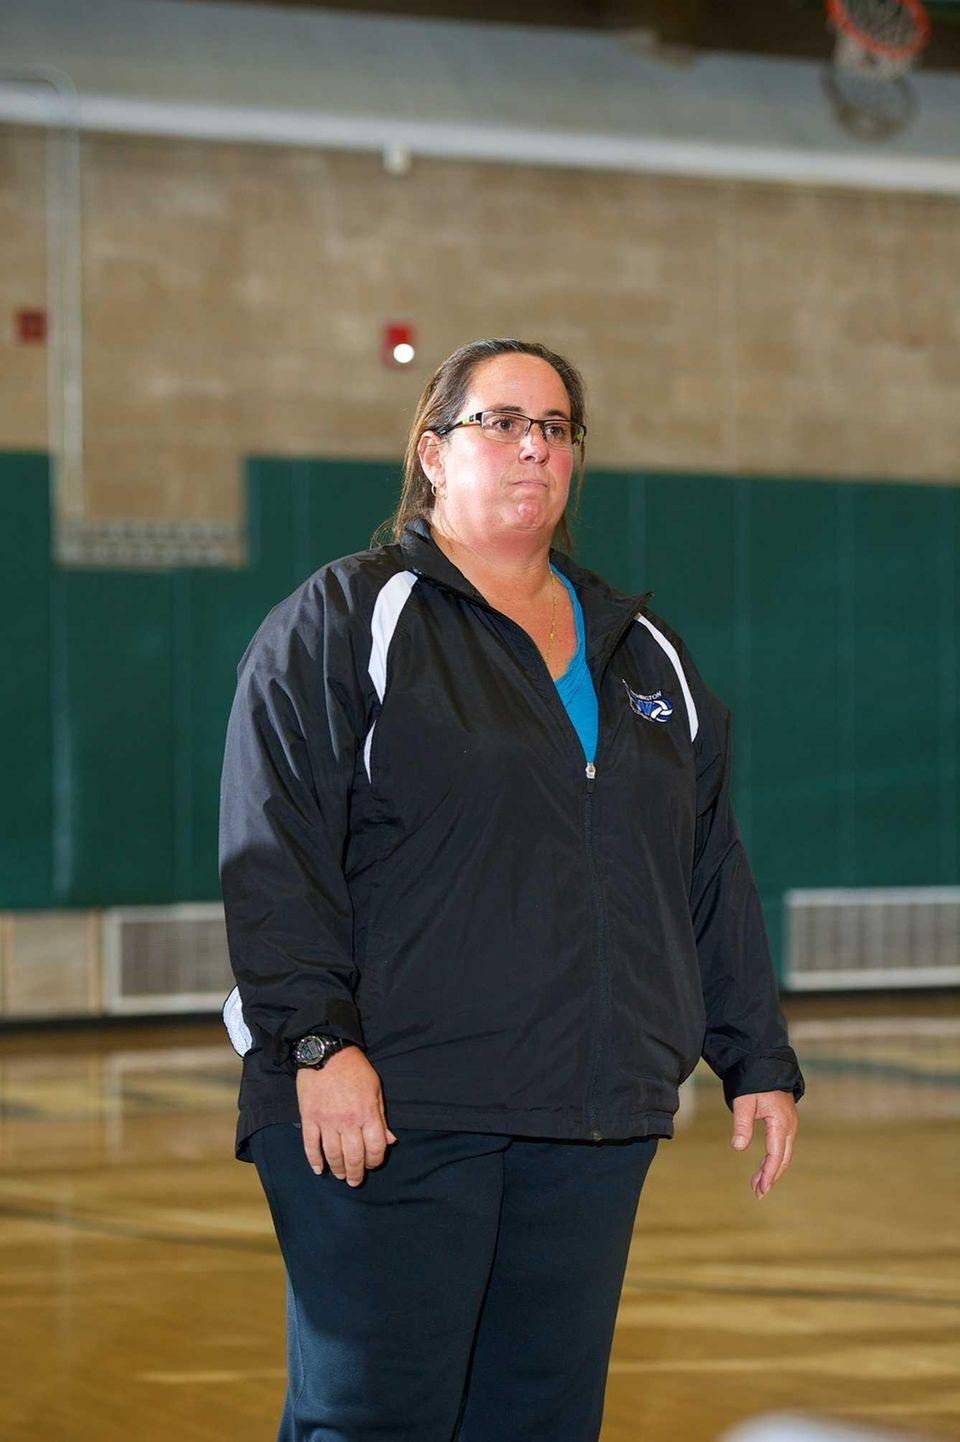 Port Washington head coach Maria Giamanco watches the